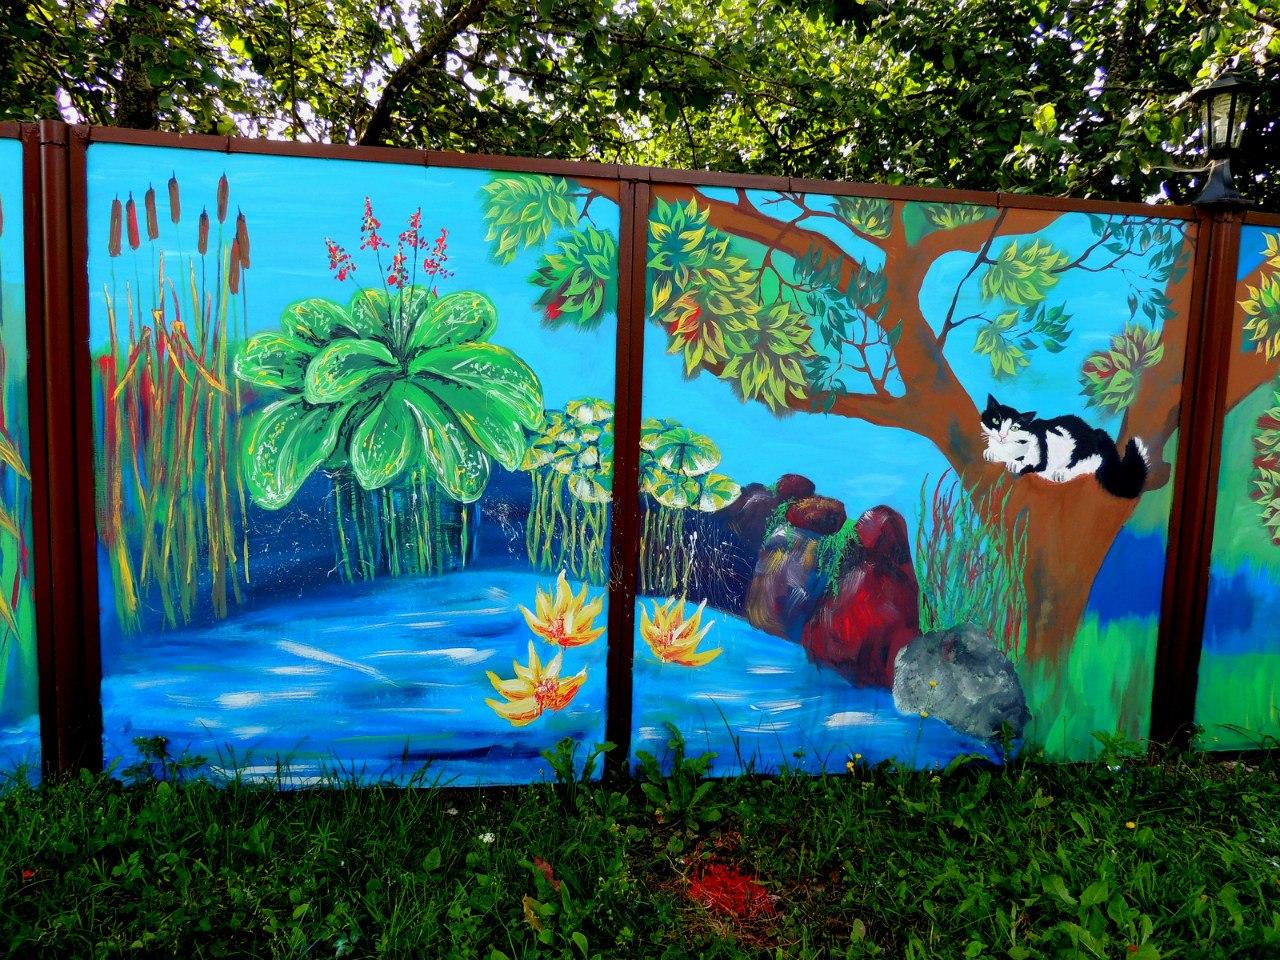 Как раскрасить забор на даче своими руками фото